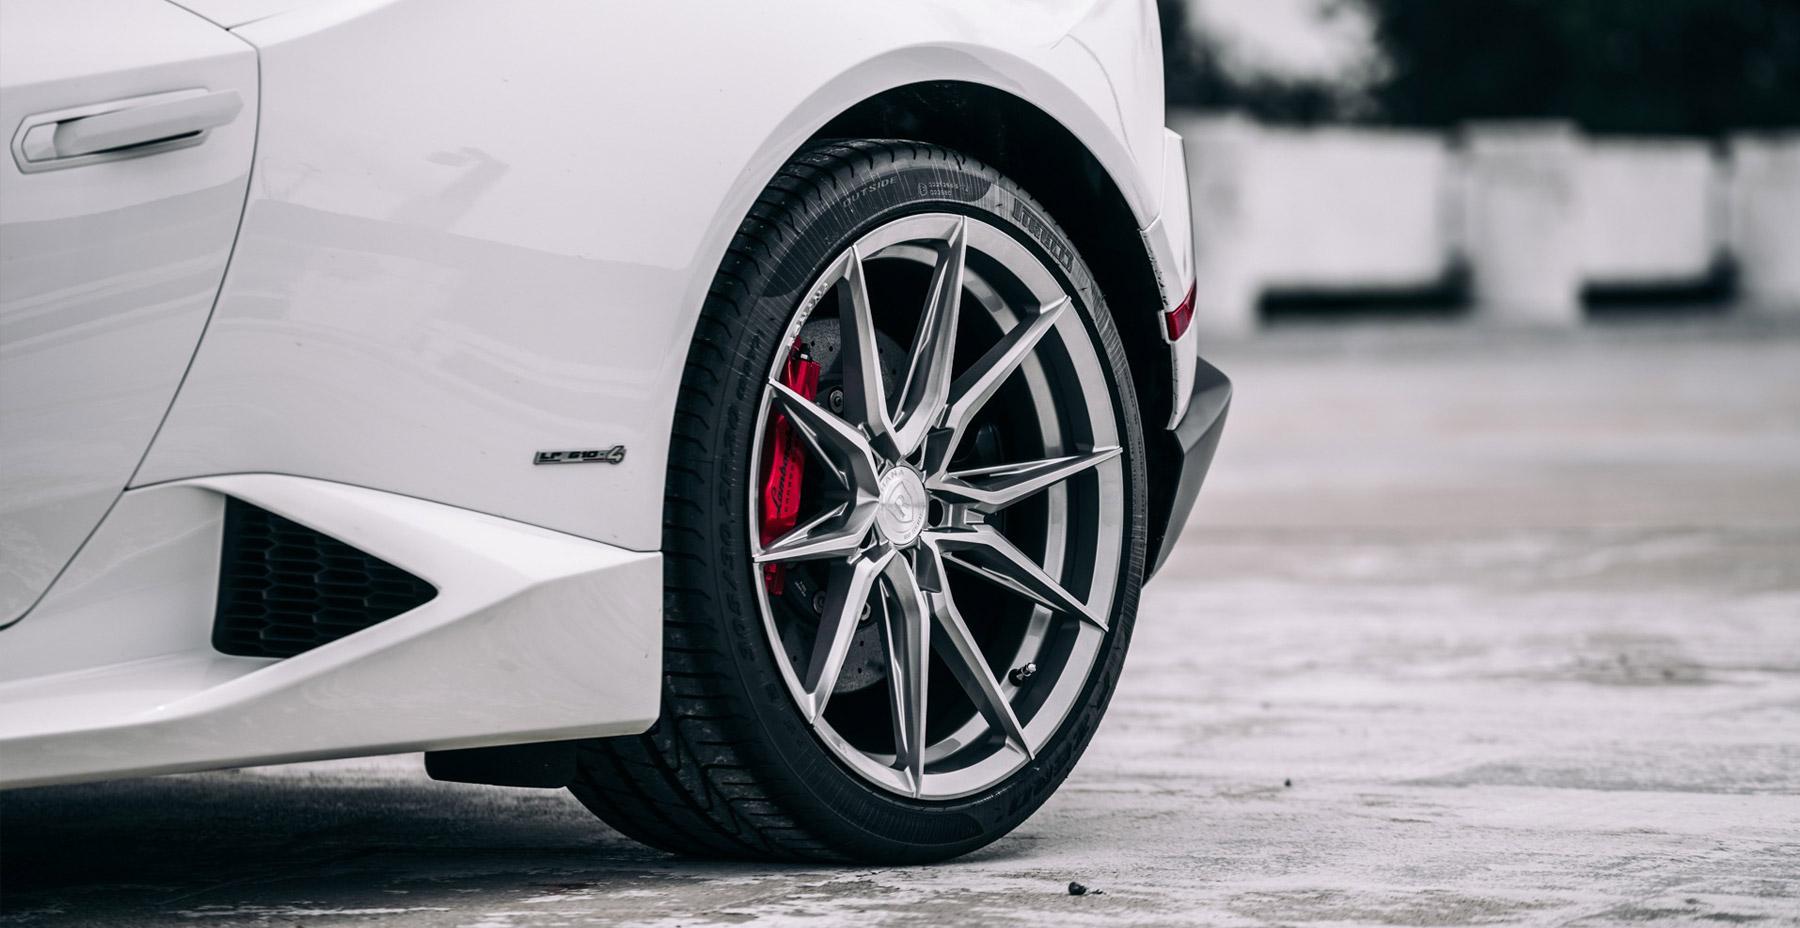 White Lamborghini Huracan x Rohana RFX13 Wheels (Finished in Brushed Titanium)